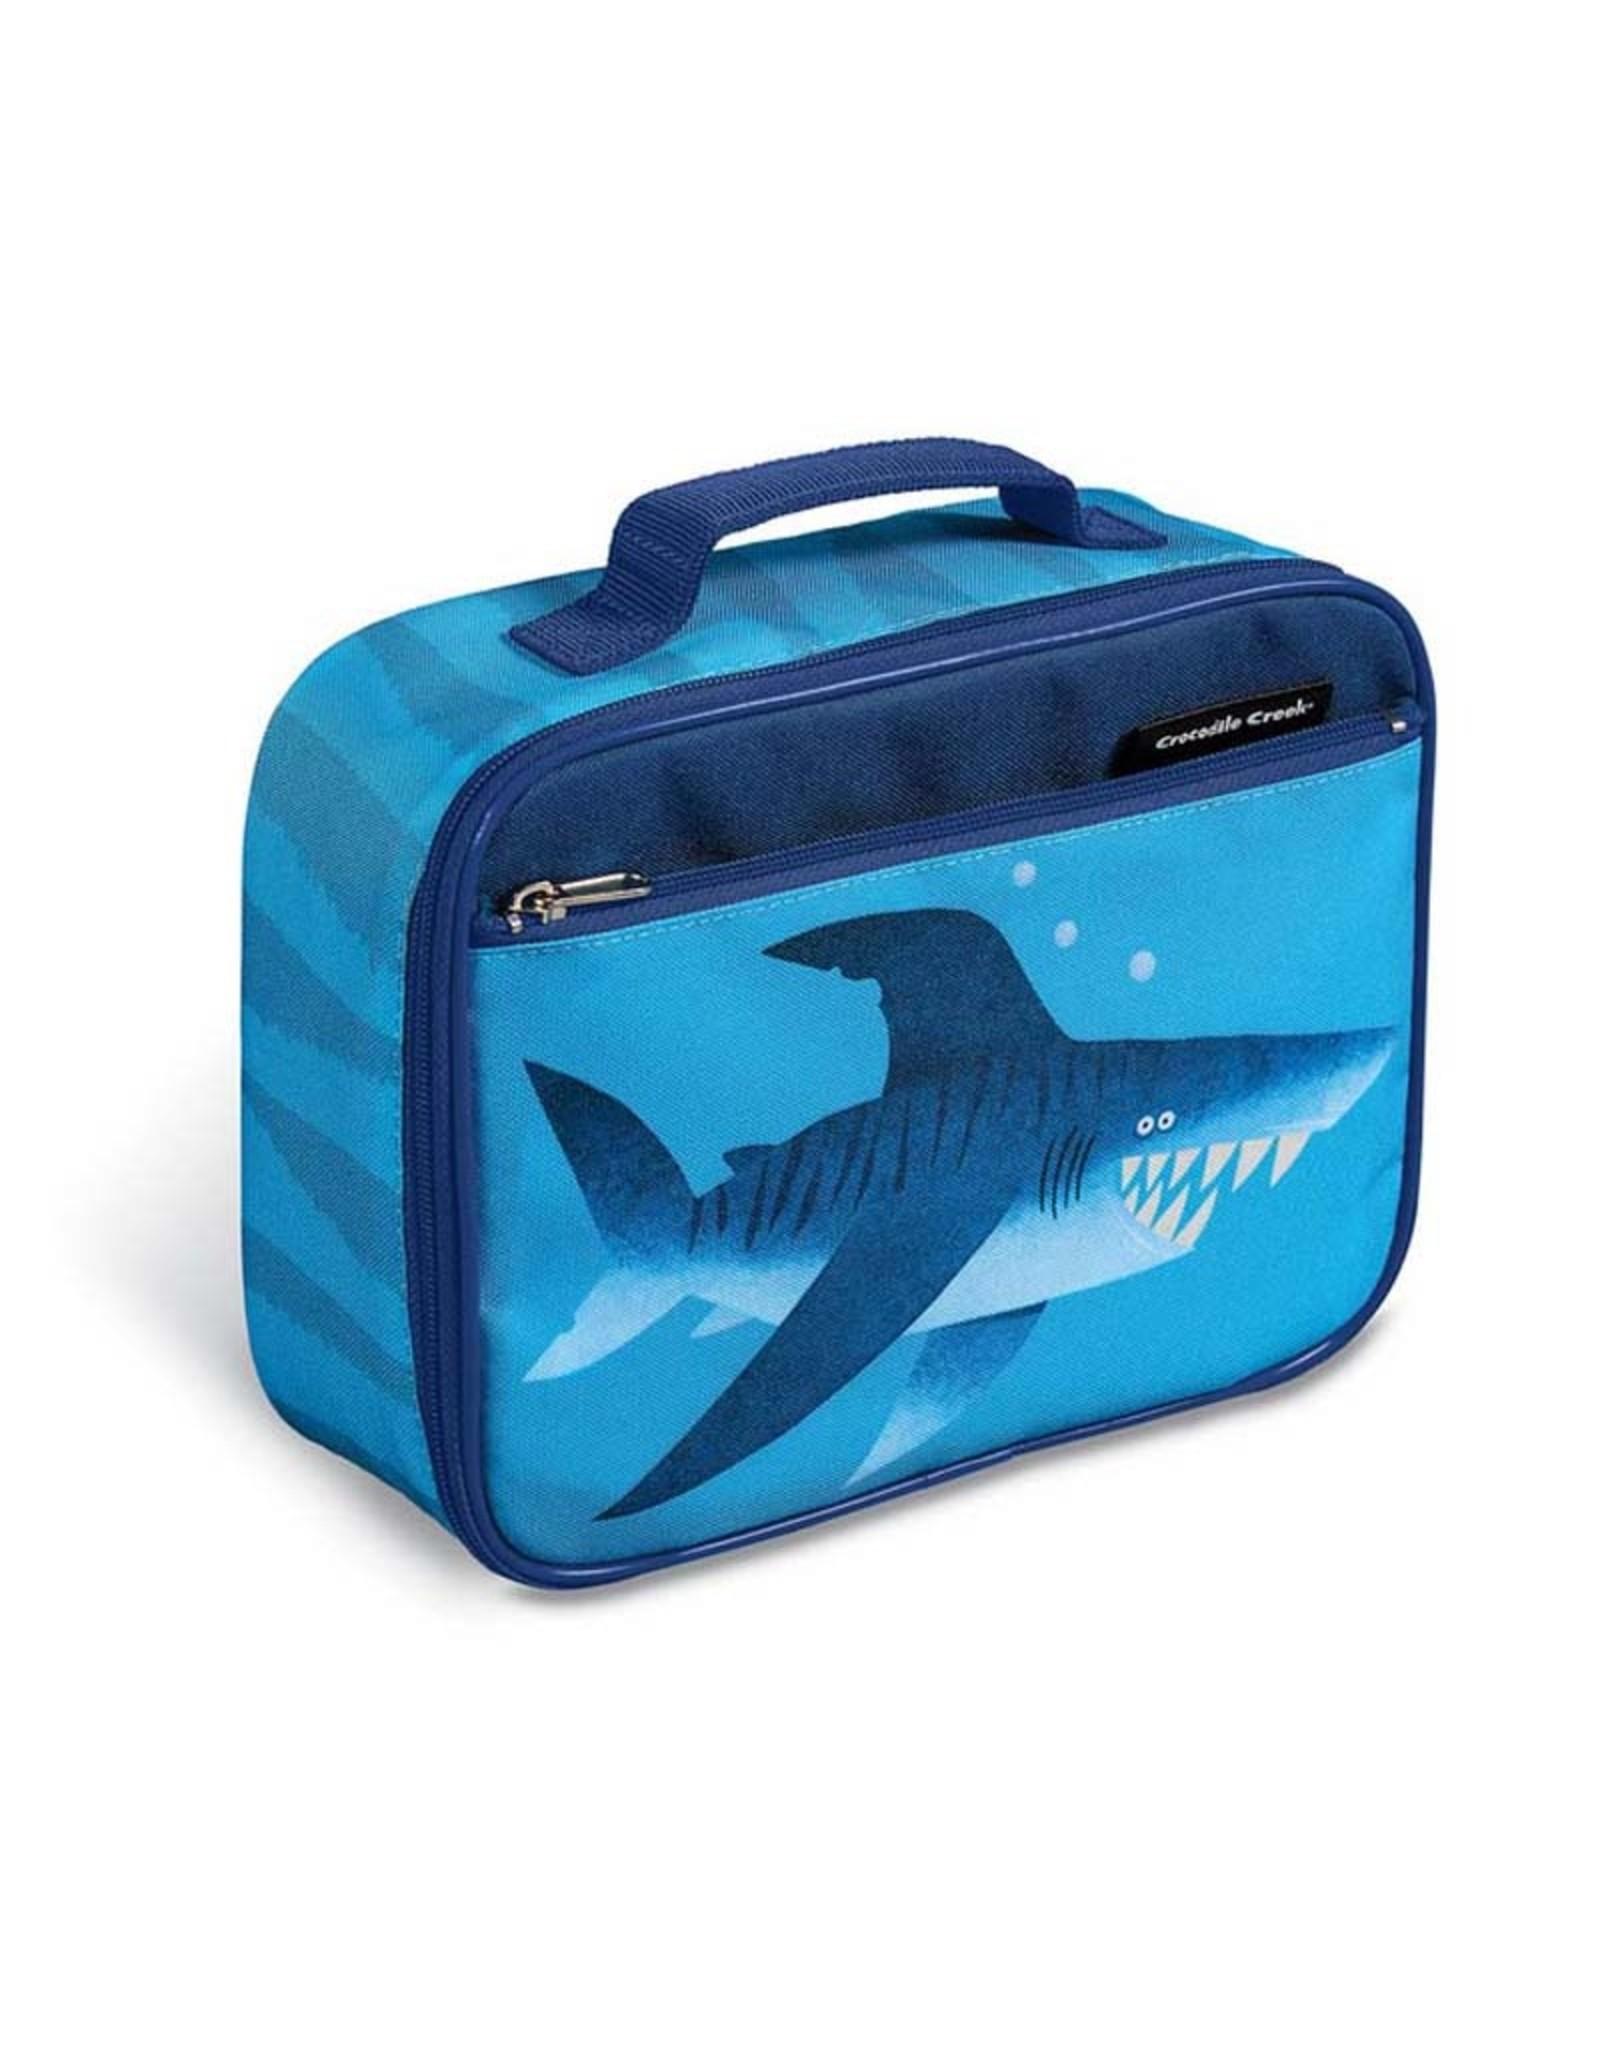 Crocodile Creek Lunch Box Shark City